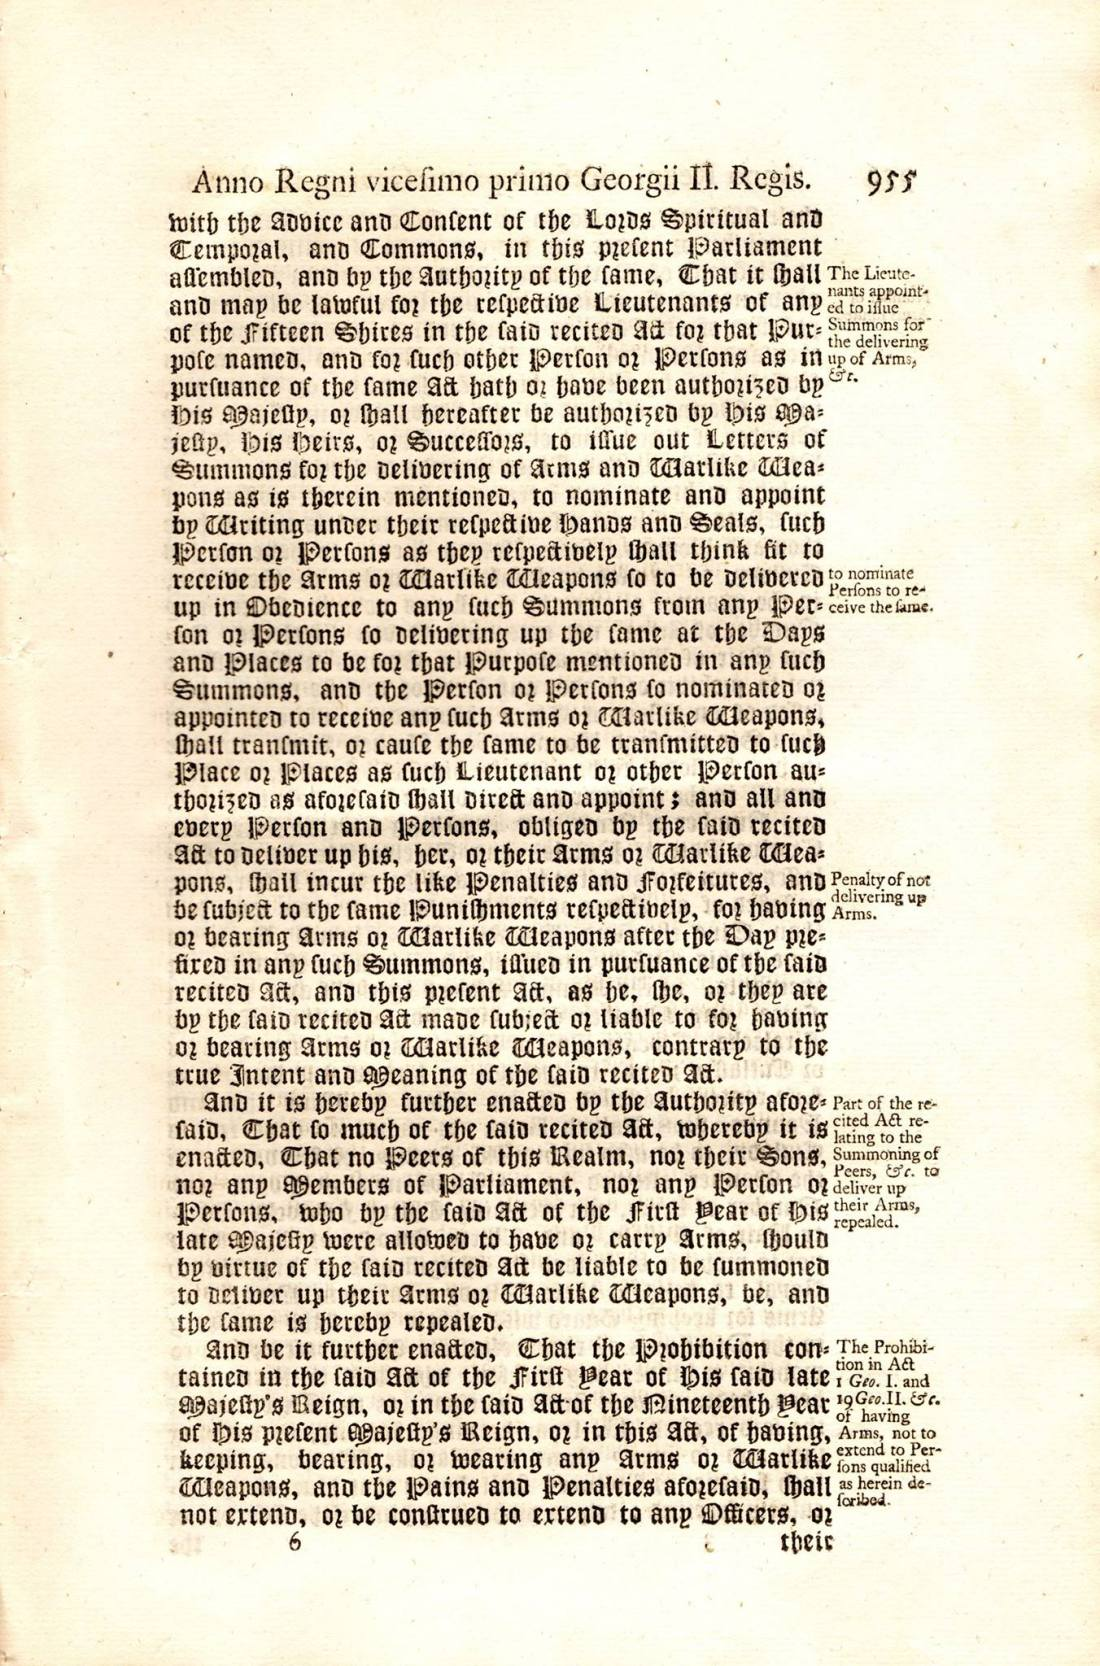 Act 1748f